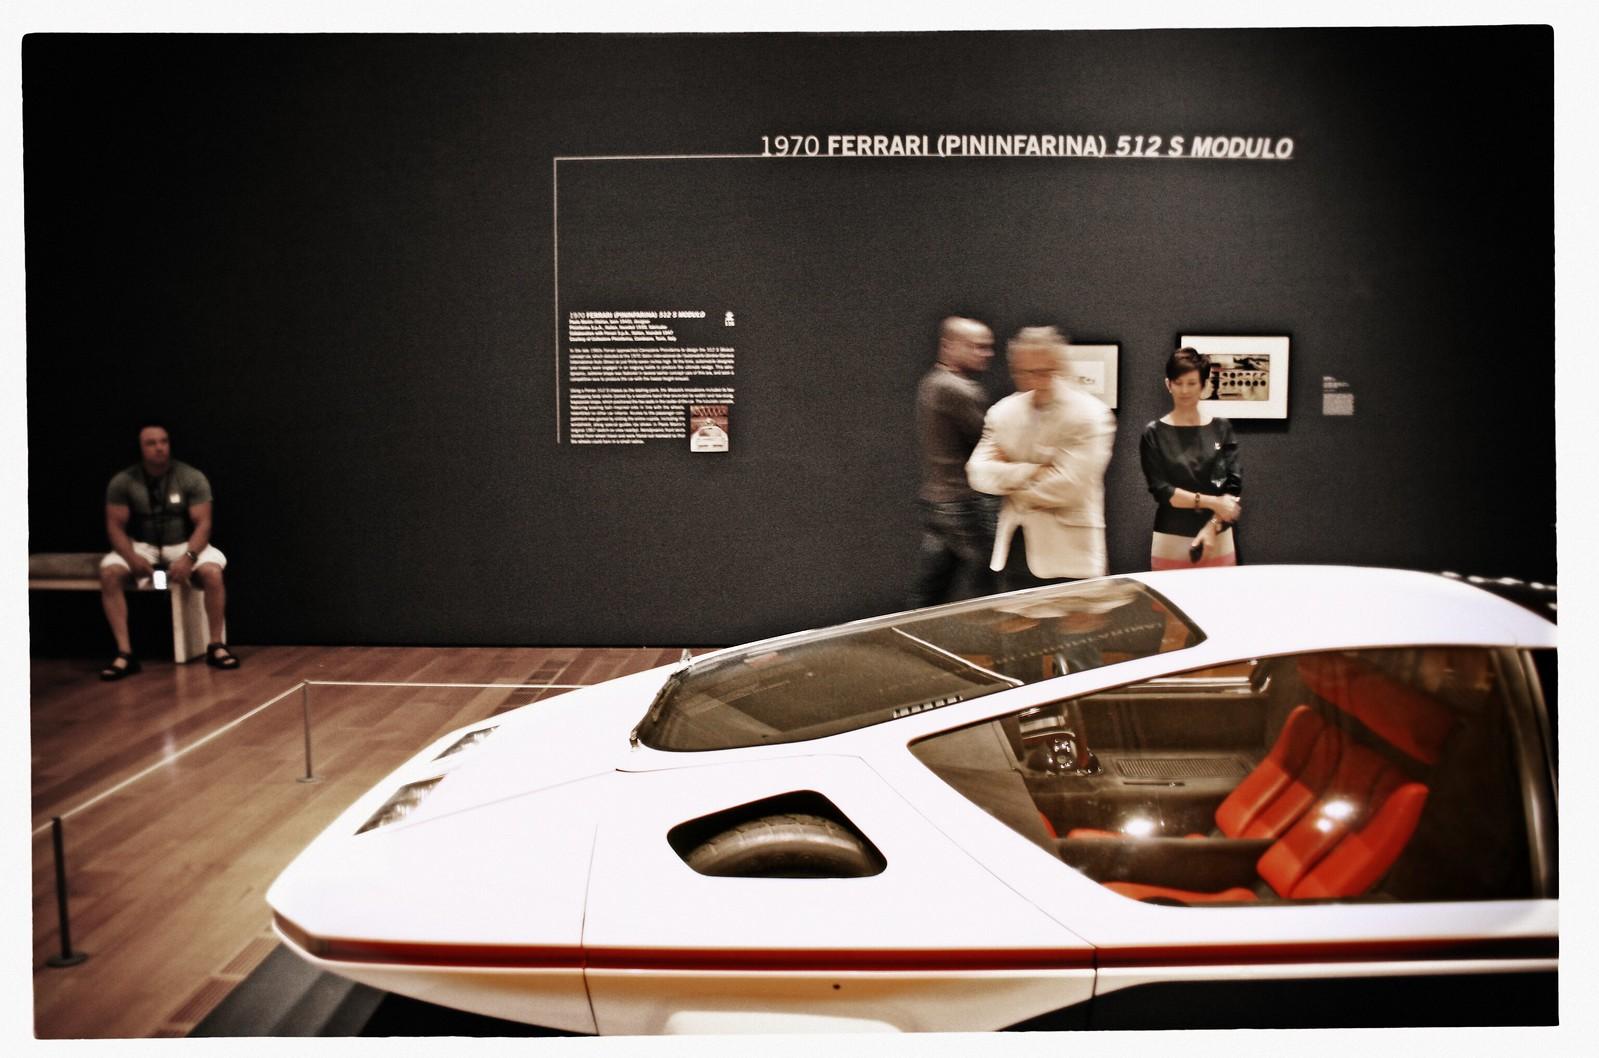 1970 Ferrari 512 S Modulo, Dream Cars Exhibit, High Museum of Art, Summer 2014